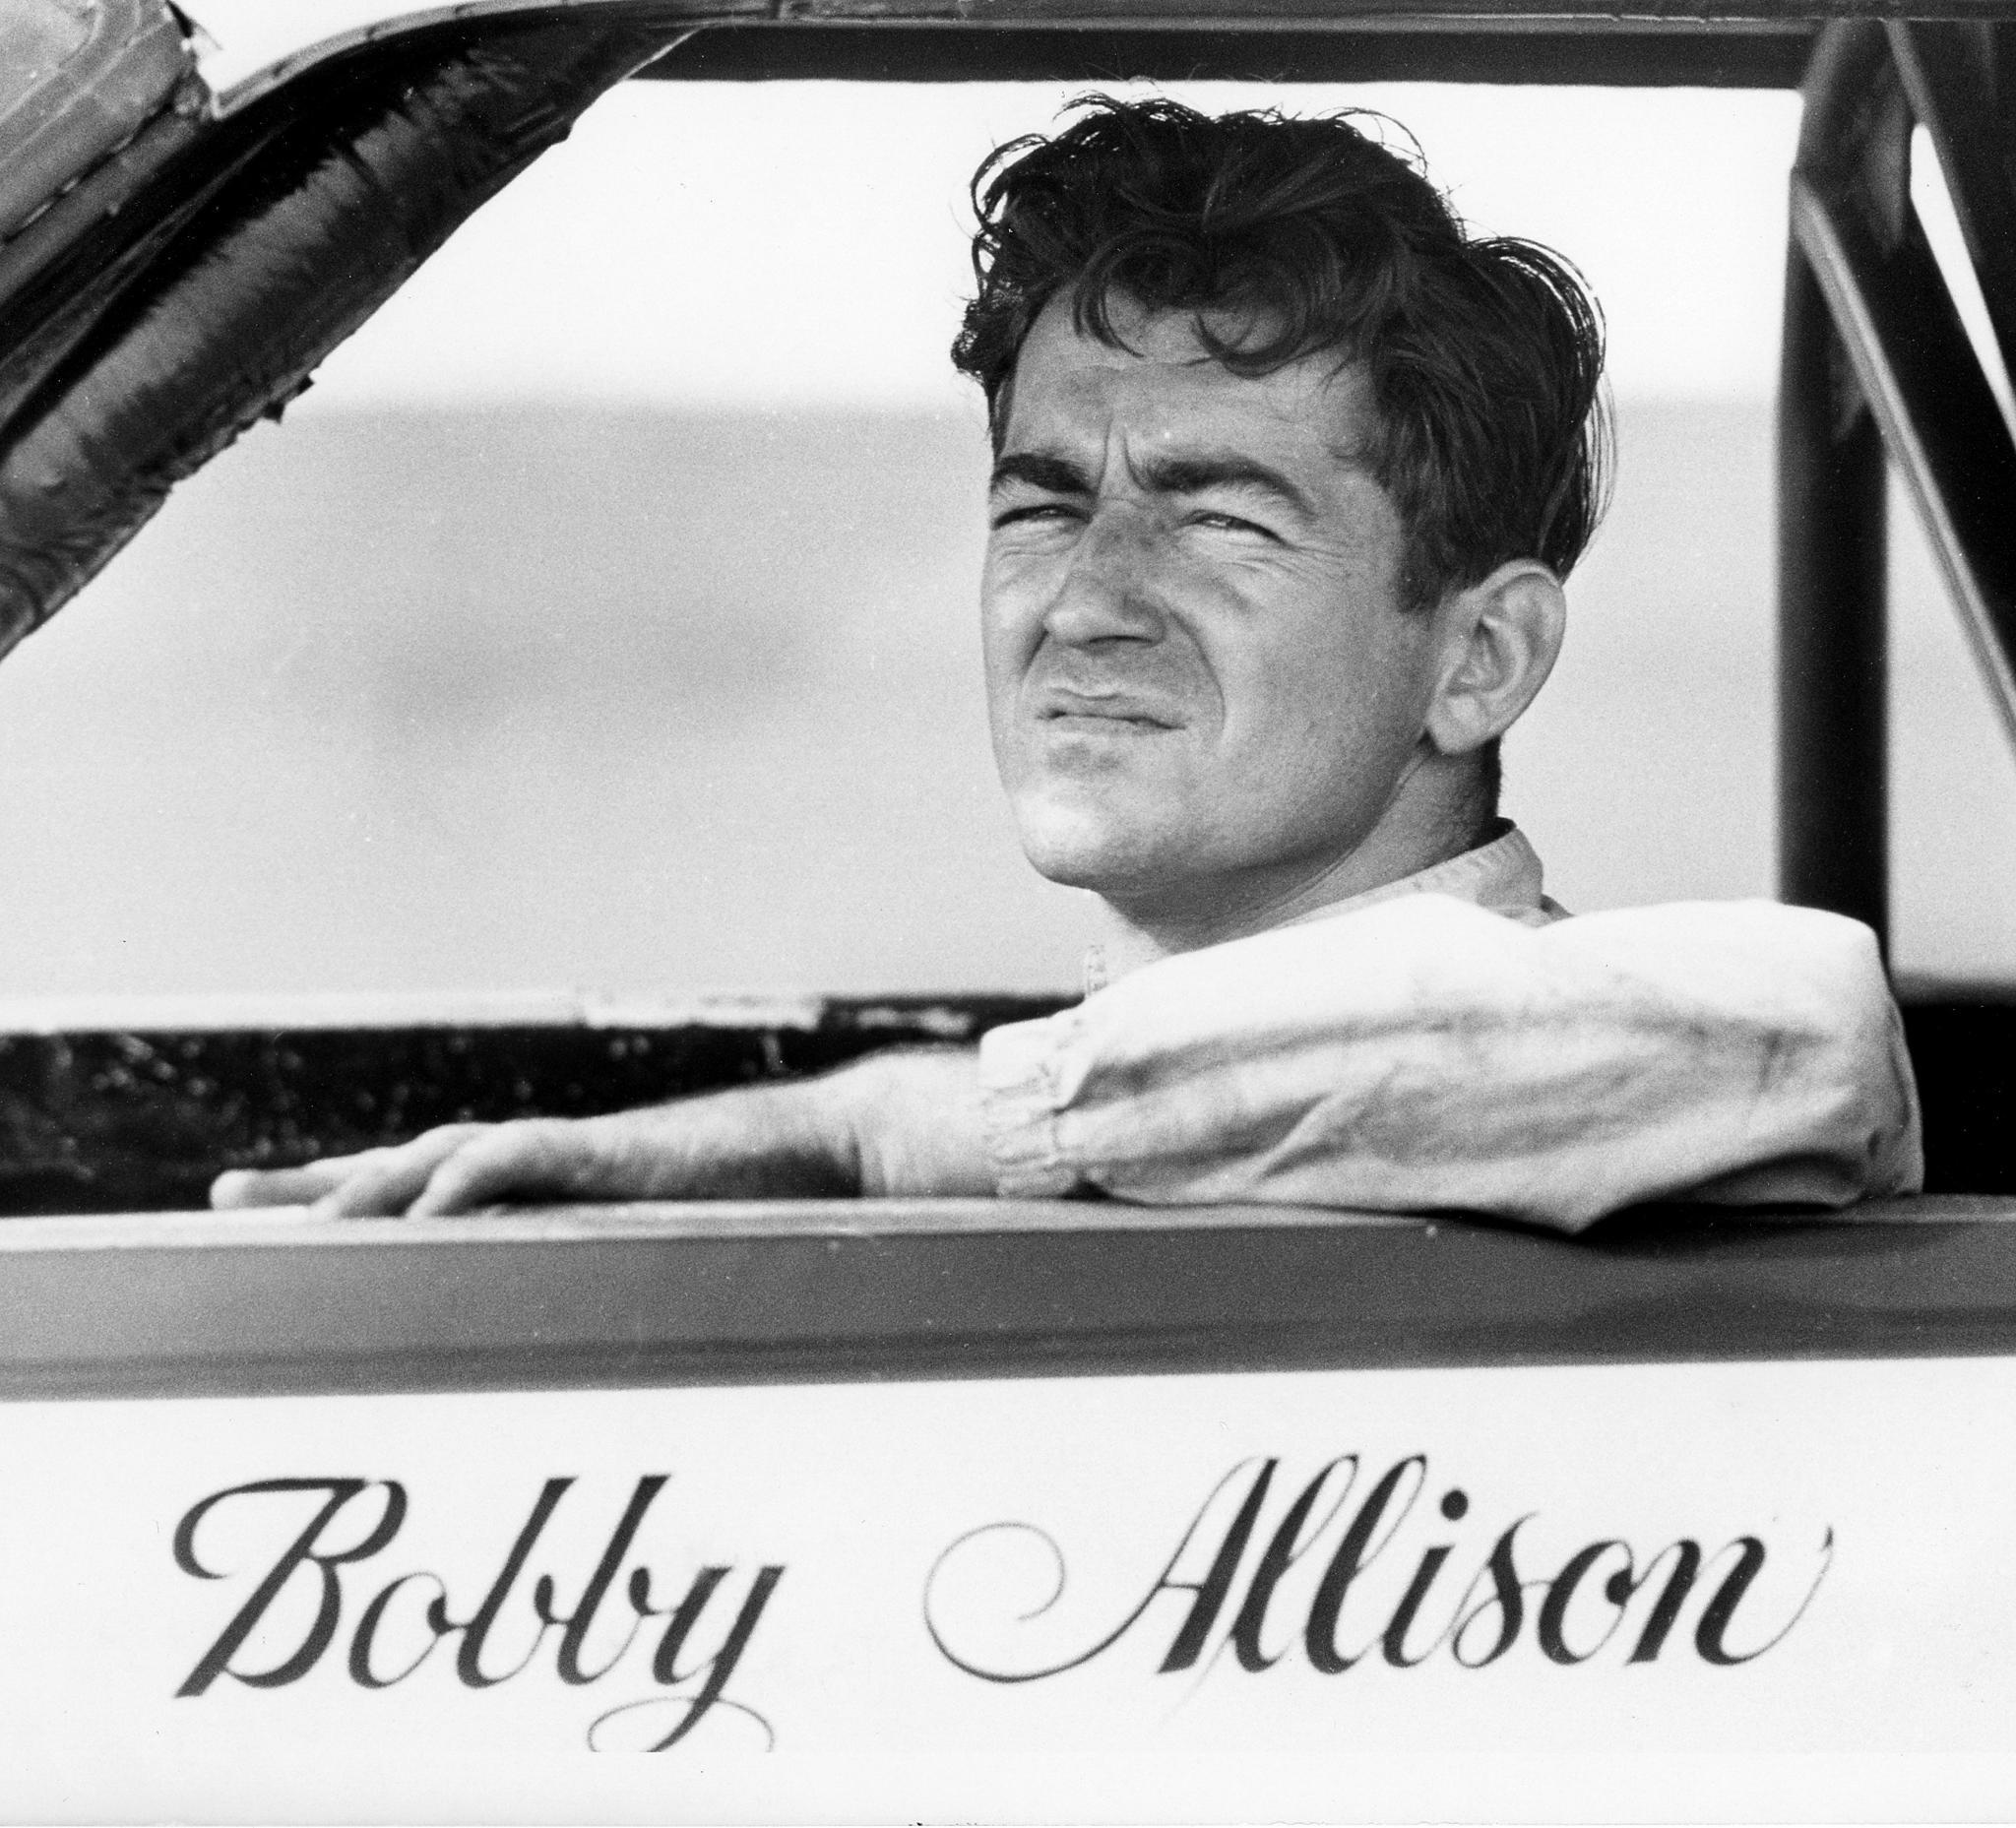 Happy Birthday to Class of 2011 Bobby Allison!